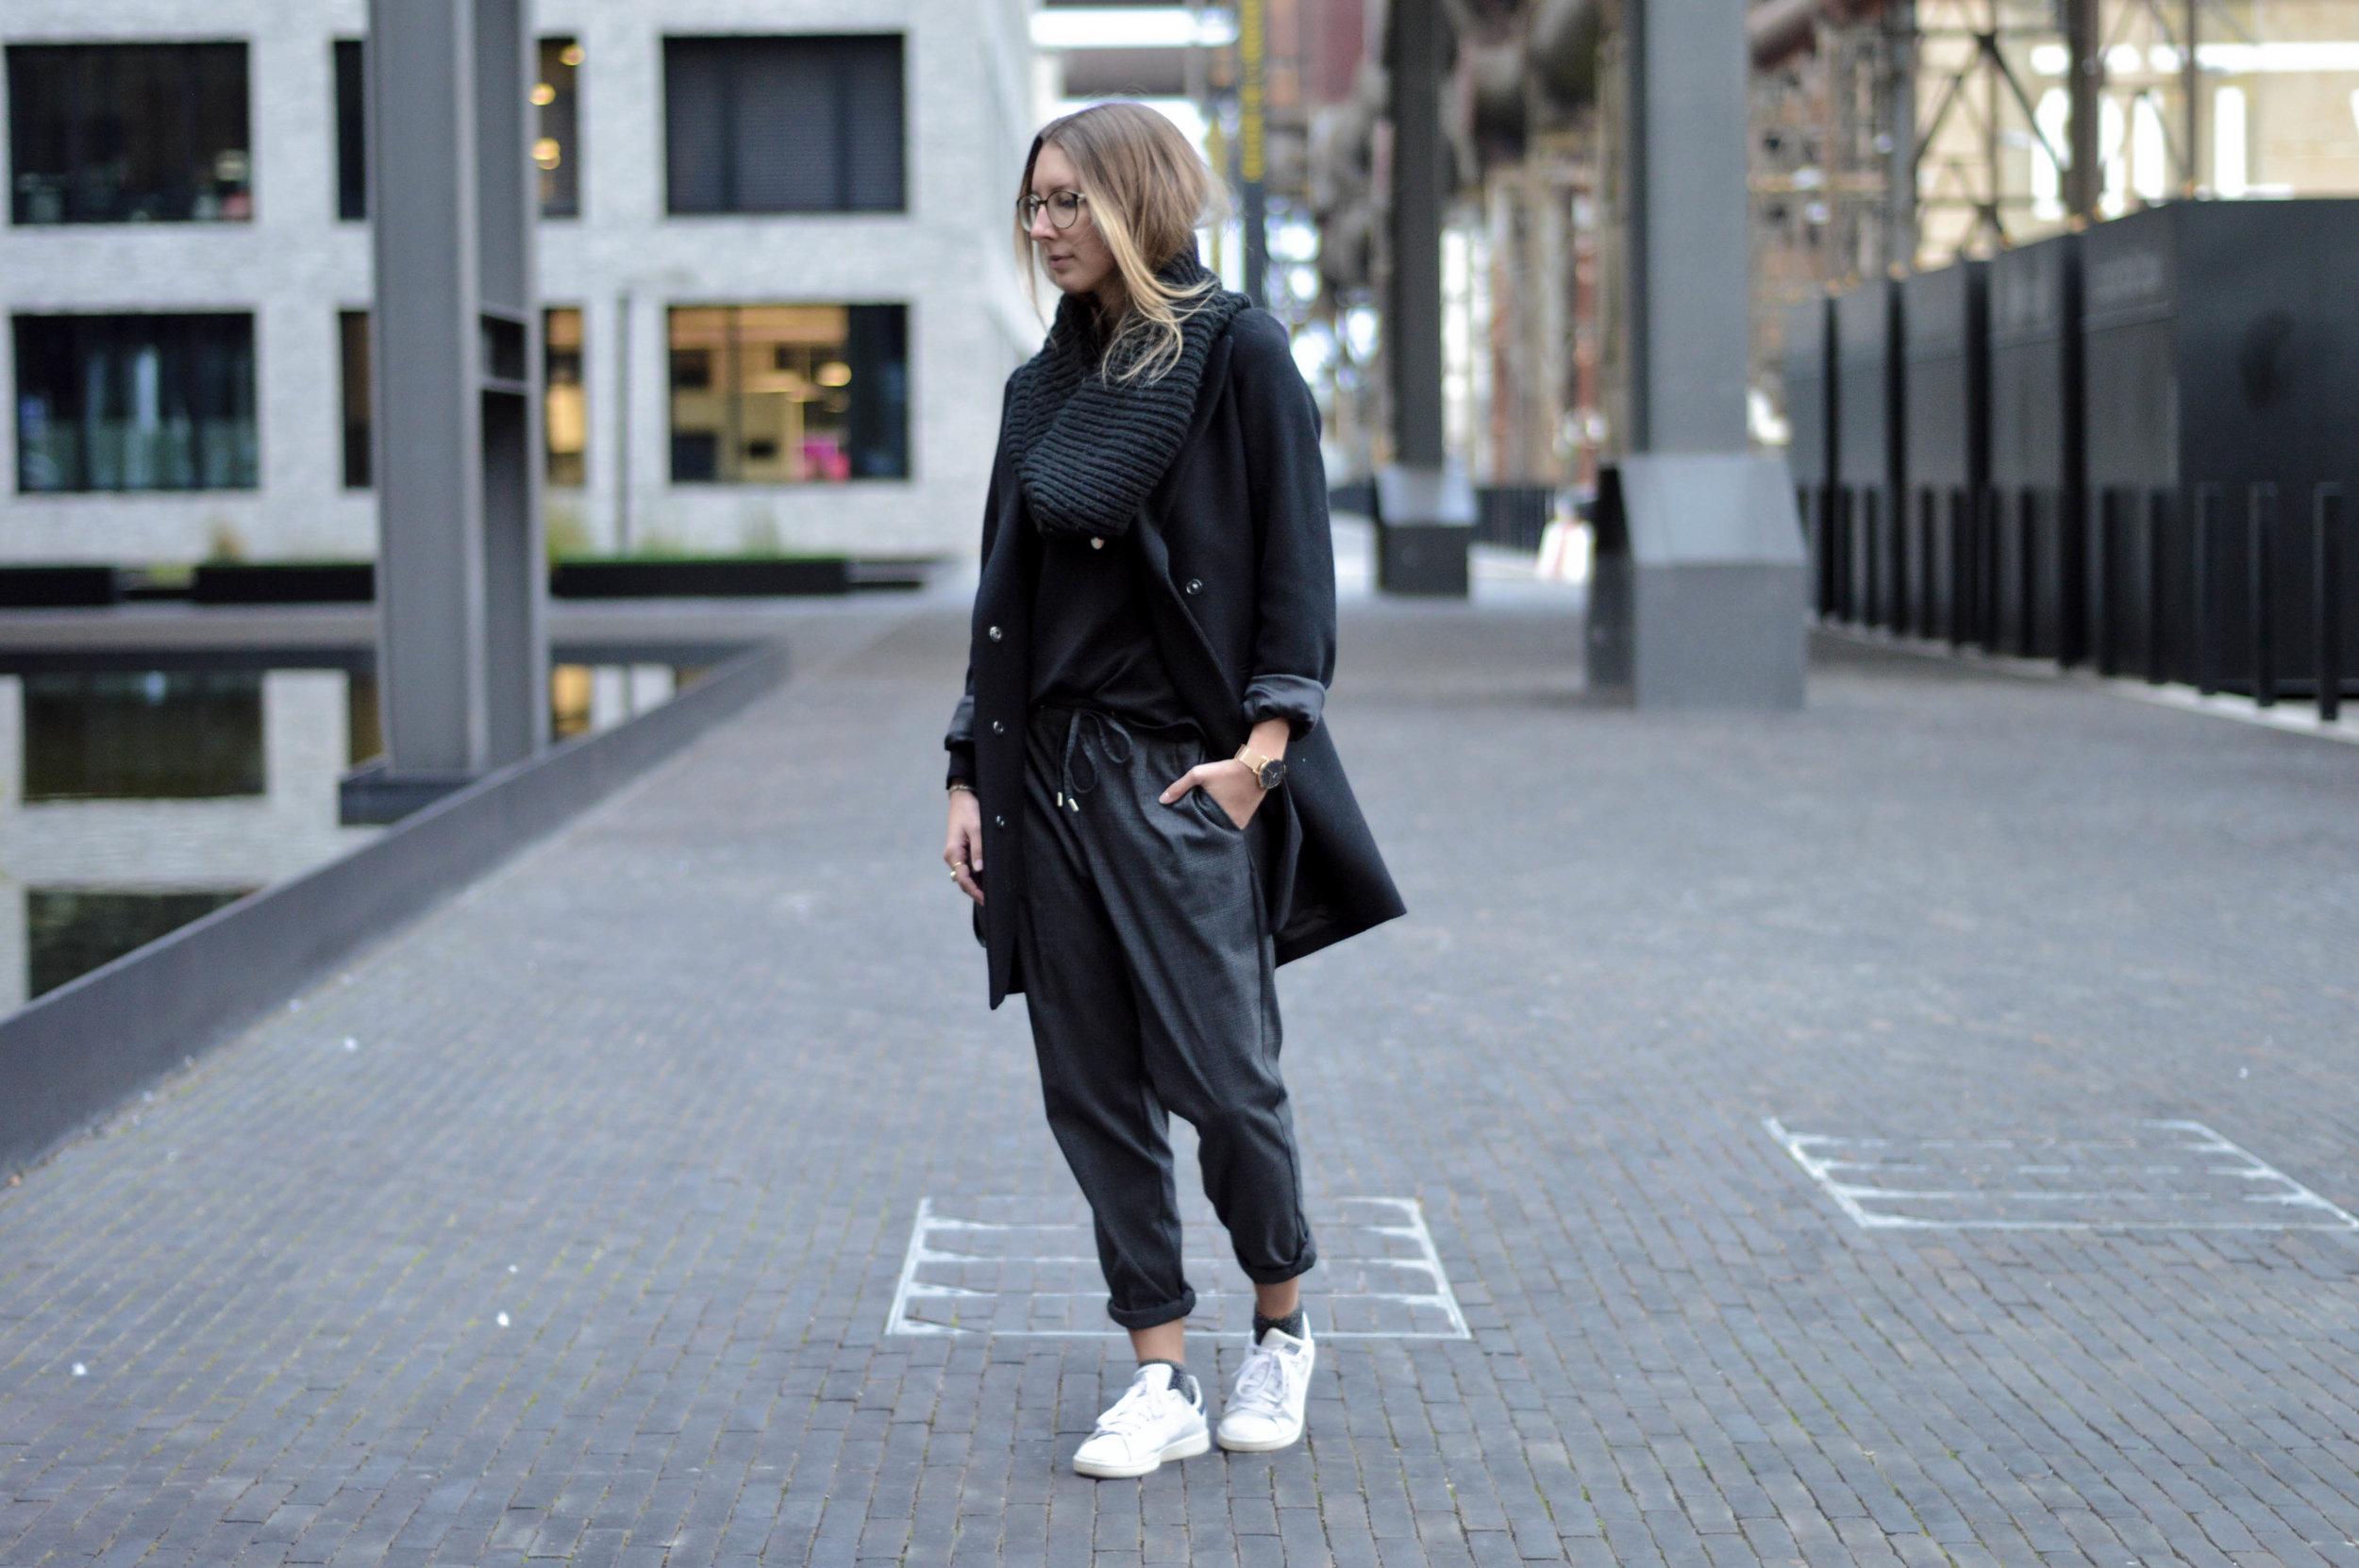 Winter Outfit - OSIARAH.COM (4 of 12).jpg